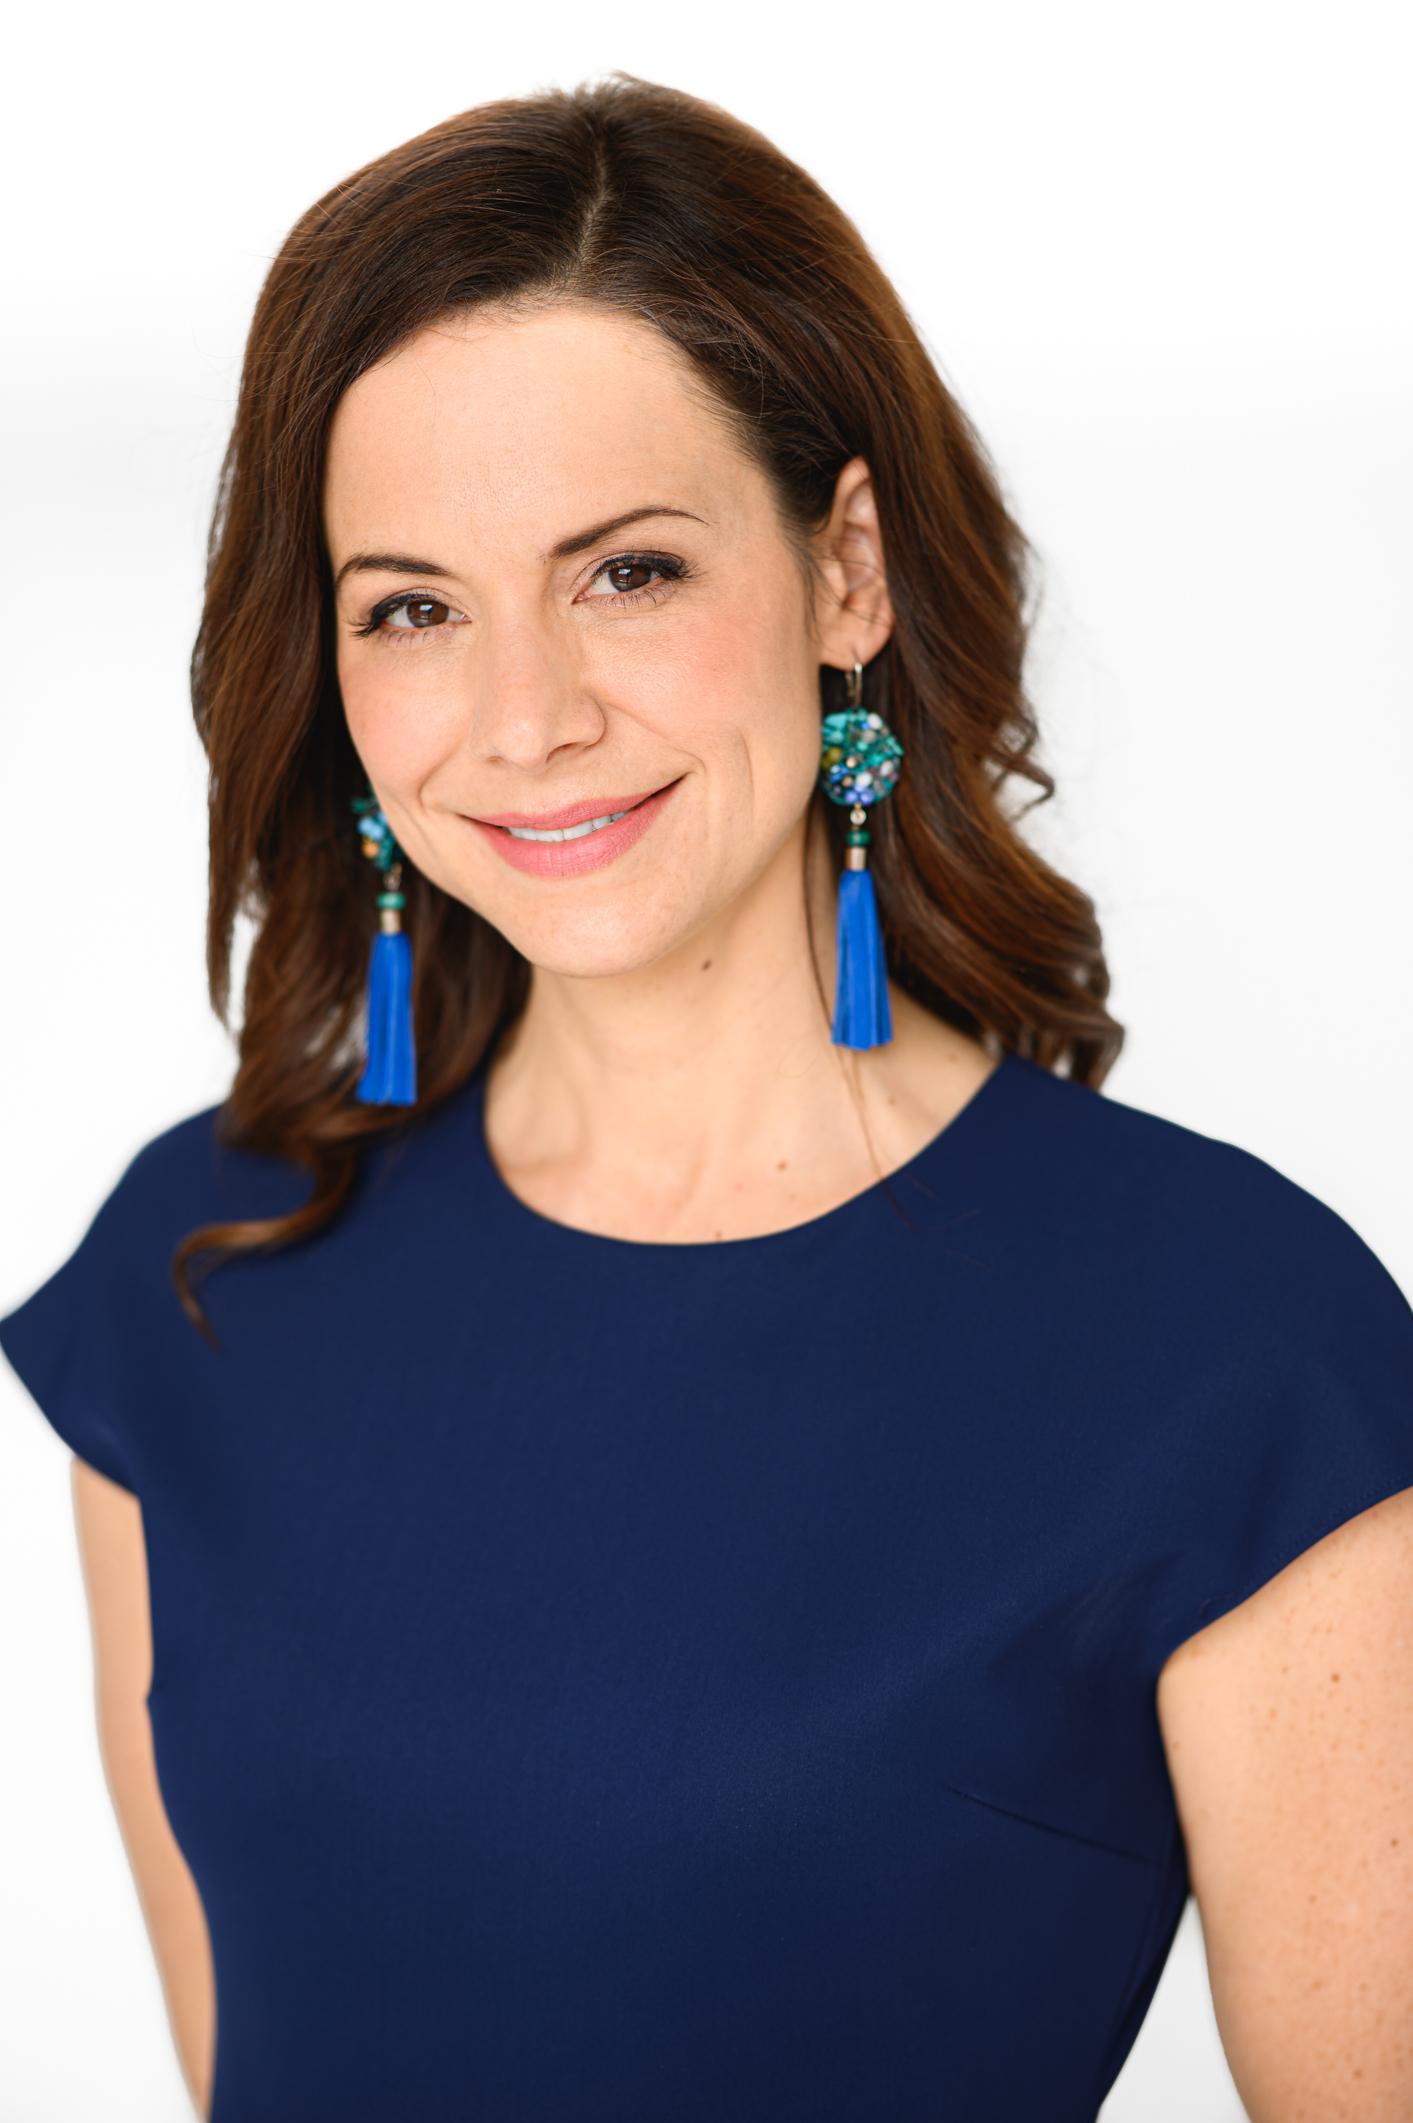 Anna Bolton - WEB - Coversion Copy Co - Headshot Photo - Branding Photo - June 2019 - Mike Black PhotoWorks dot come-8668.jpg